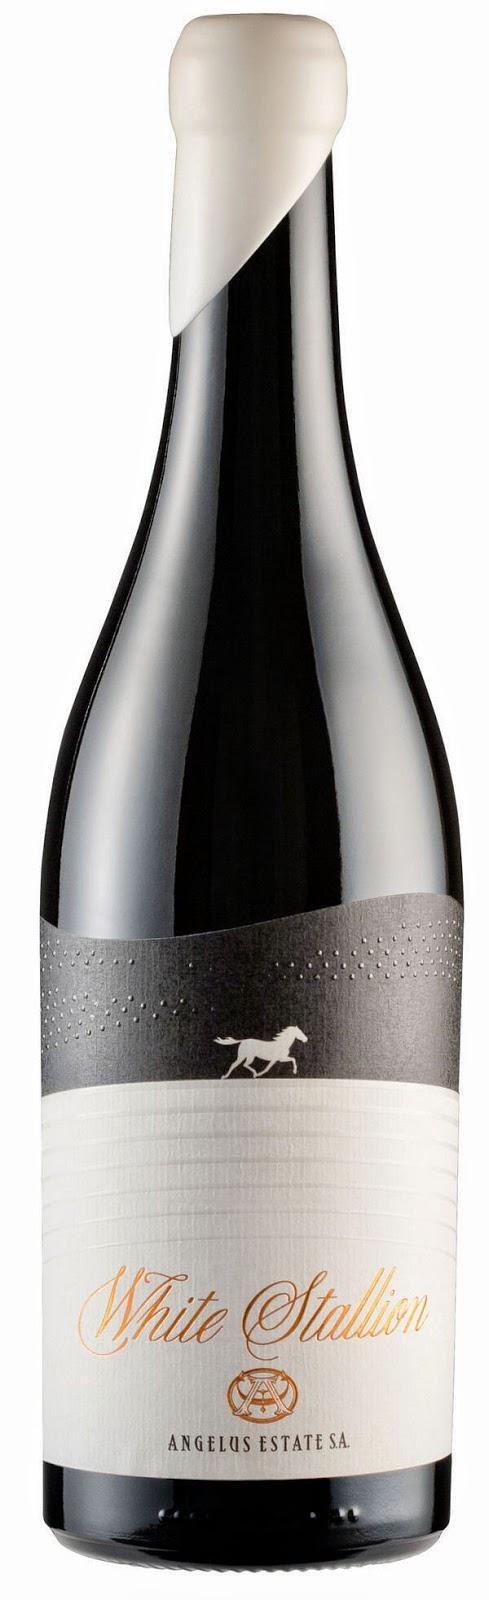 packaging naming bulgaria bianco cavallo labelling marketing azienda vinicola design